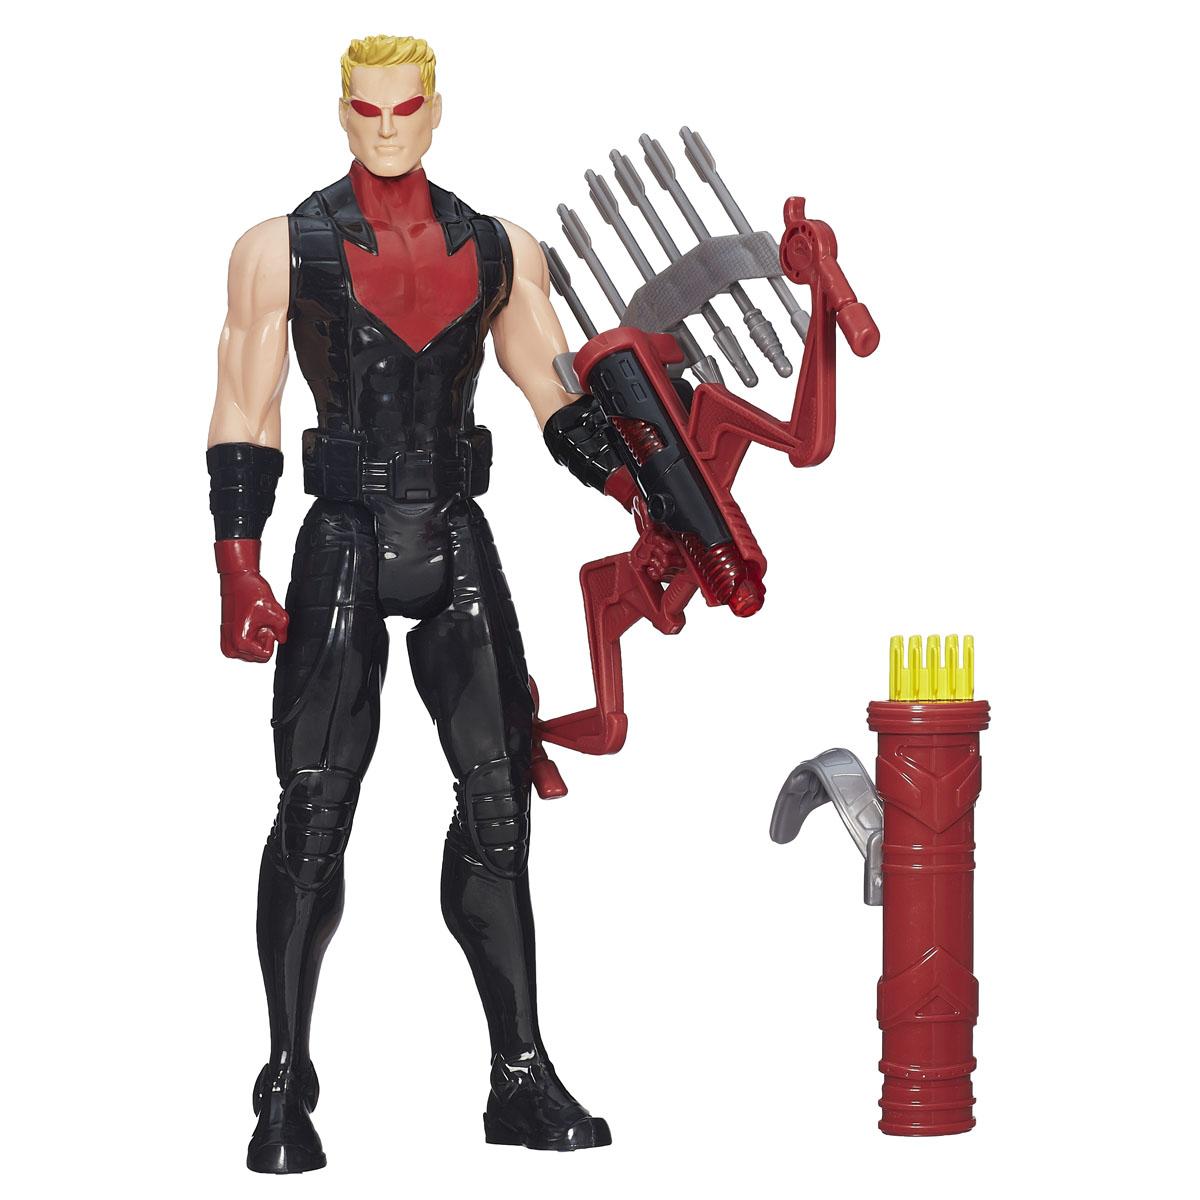 Фигурка Avengers Титаны: Marvel's Hawkeye, с аксессуарами, 29 см фигурка avengers титаны marvel s hawkeye с аксессуарами 29 см